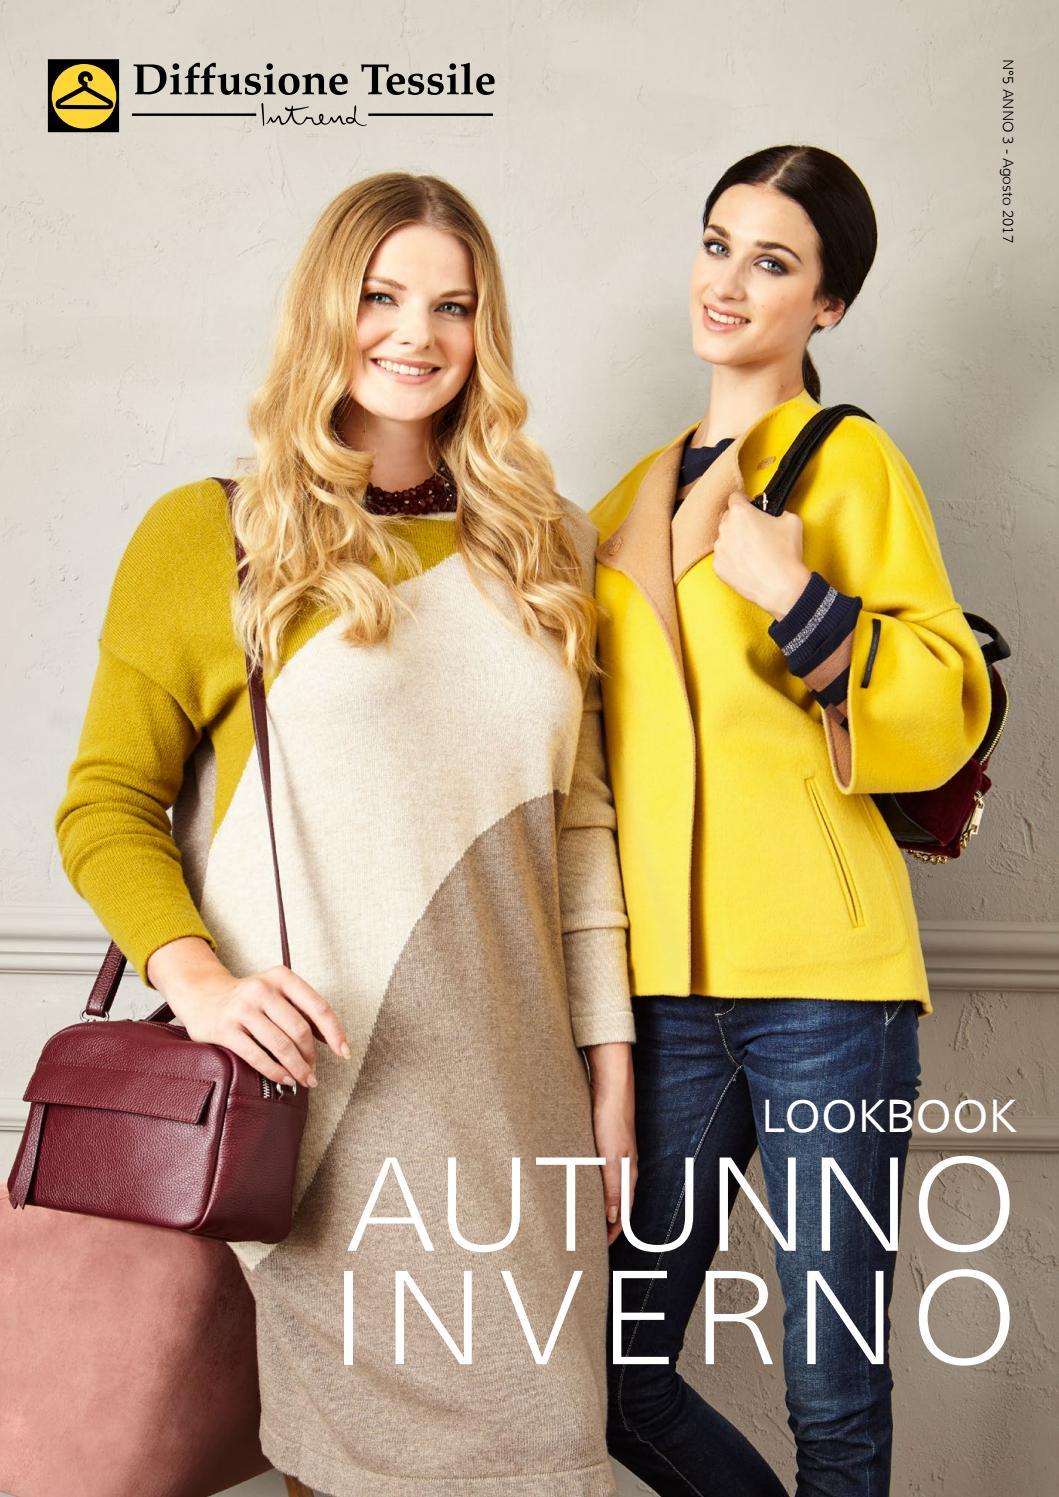 info for 62261 1004f Lookbook AUTUNNO-INVERNO 2017 by Diffusione Tessile - issuu